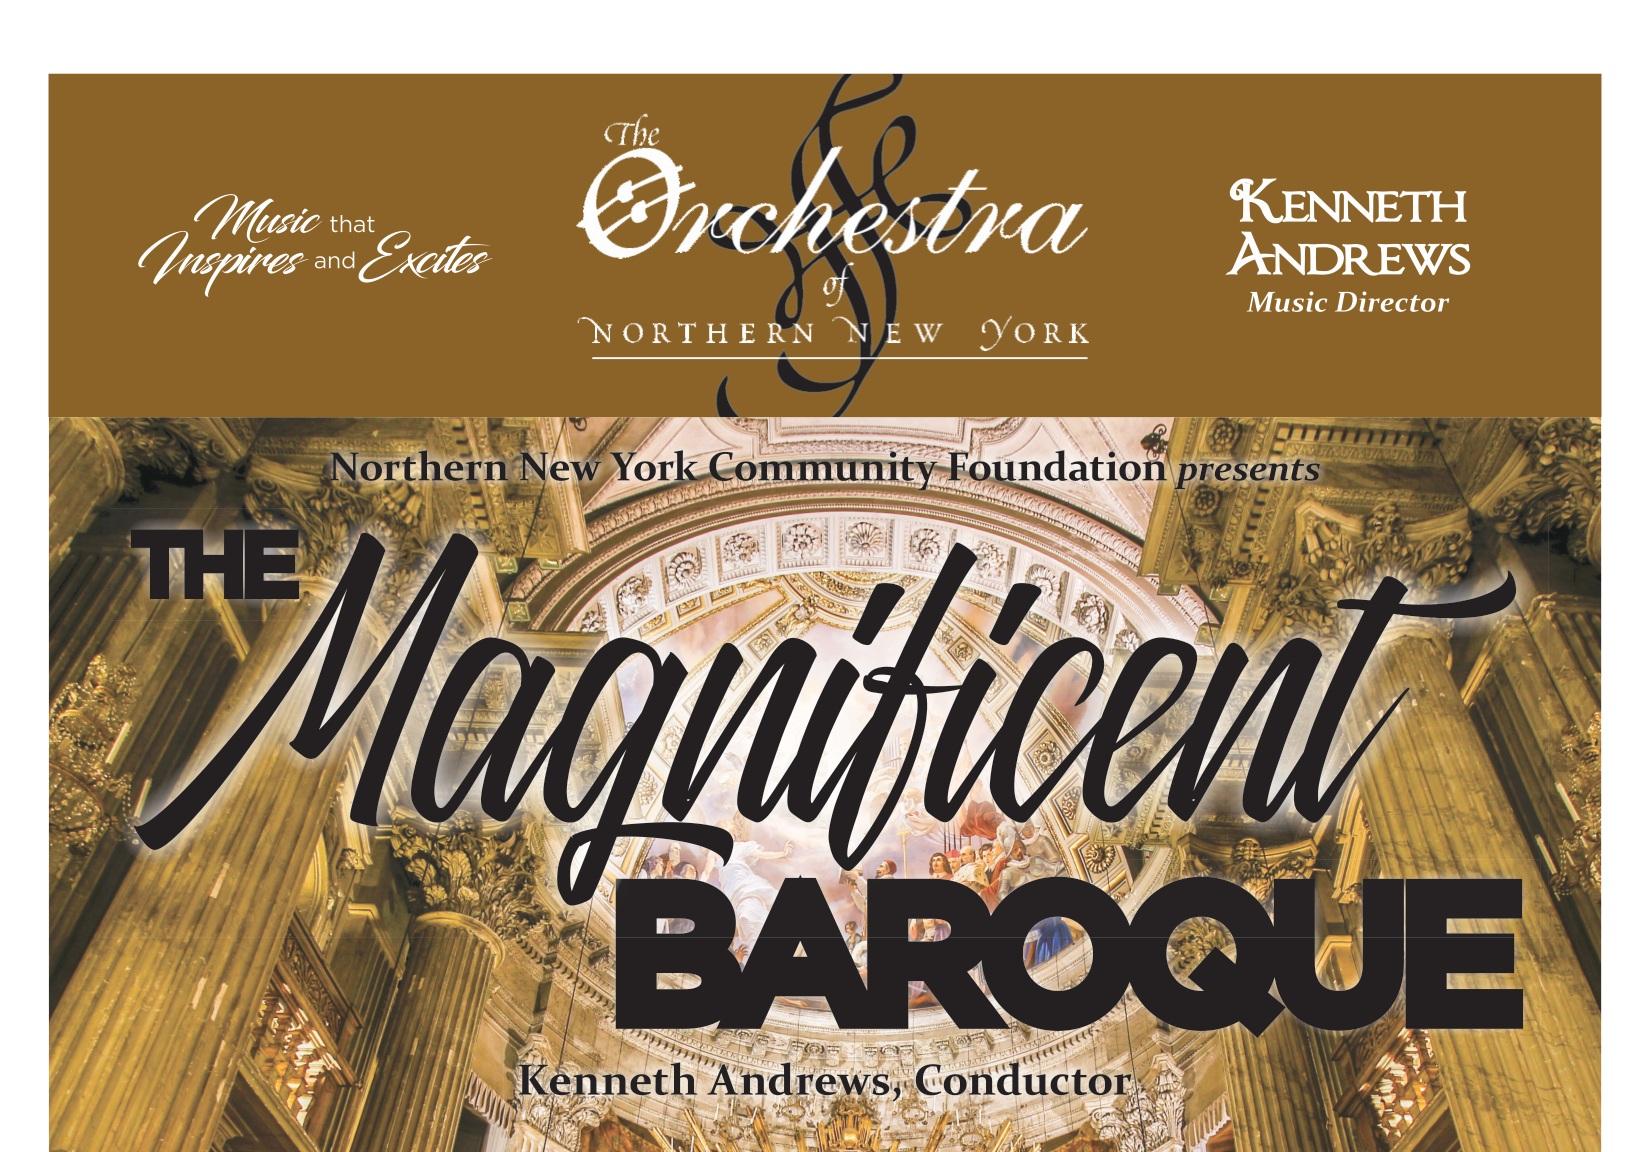 baroque_poster_2019.jpg